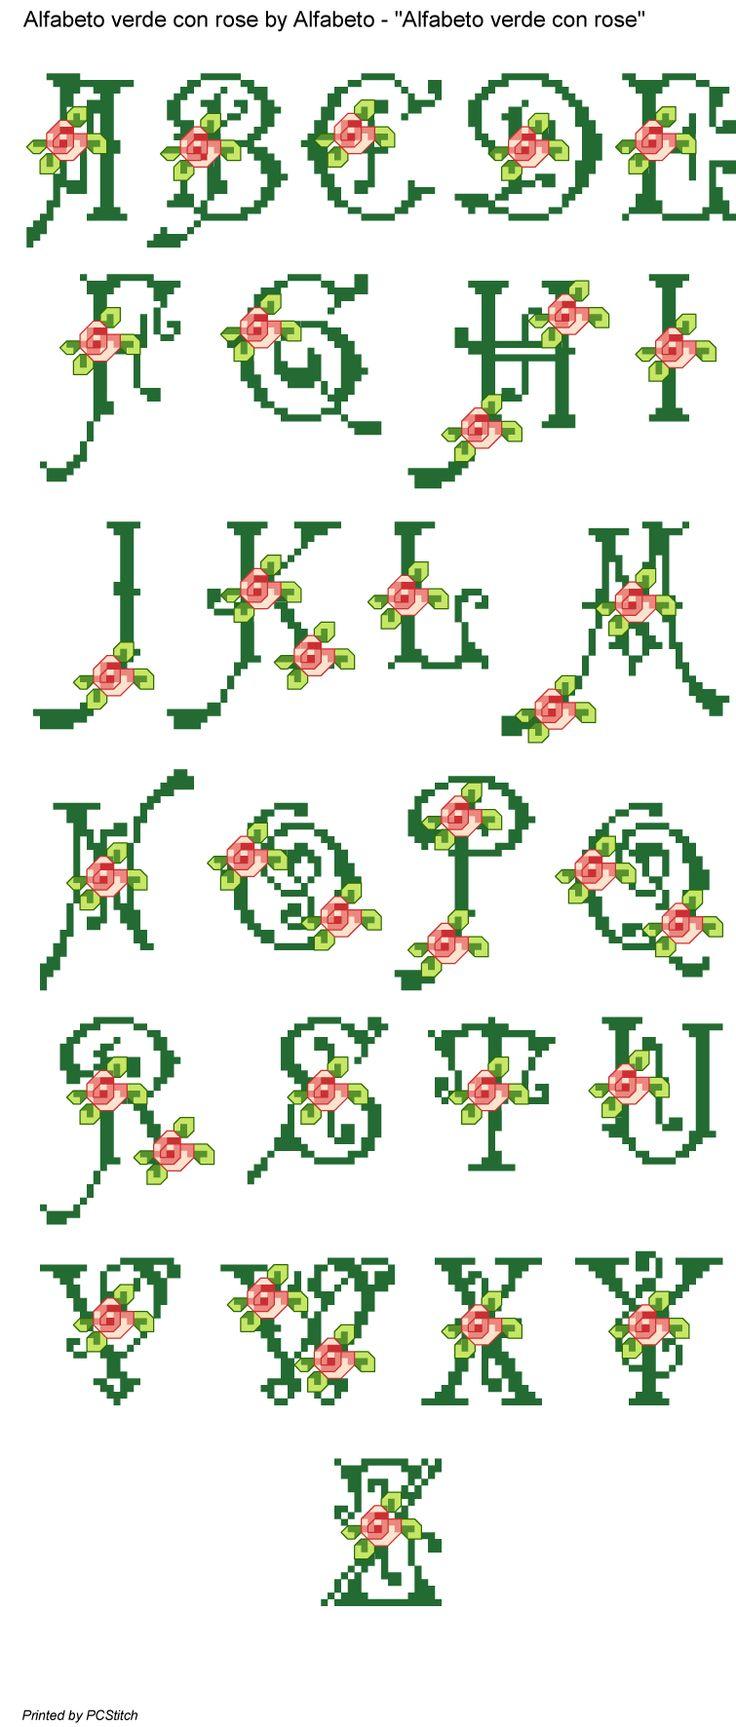 Alfabeto verde con rose